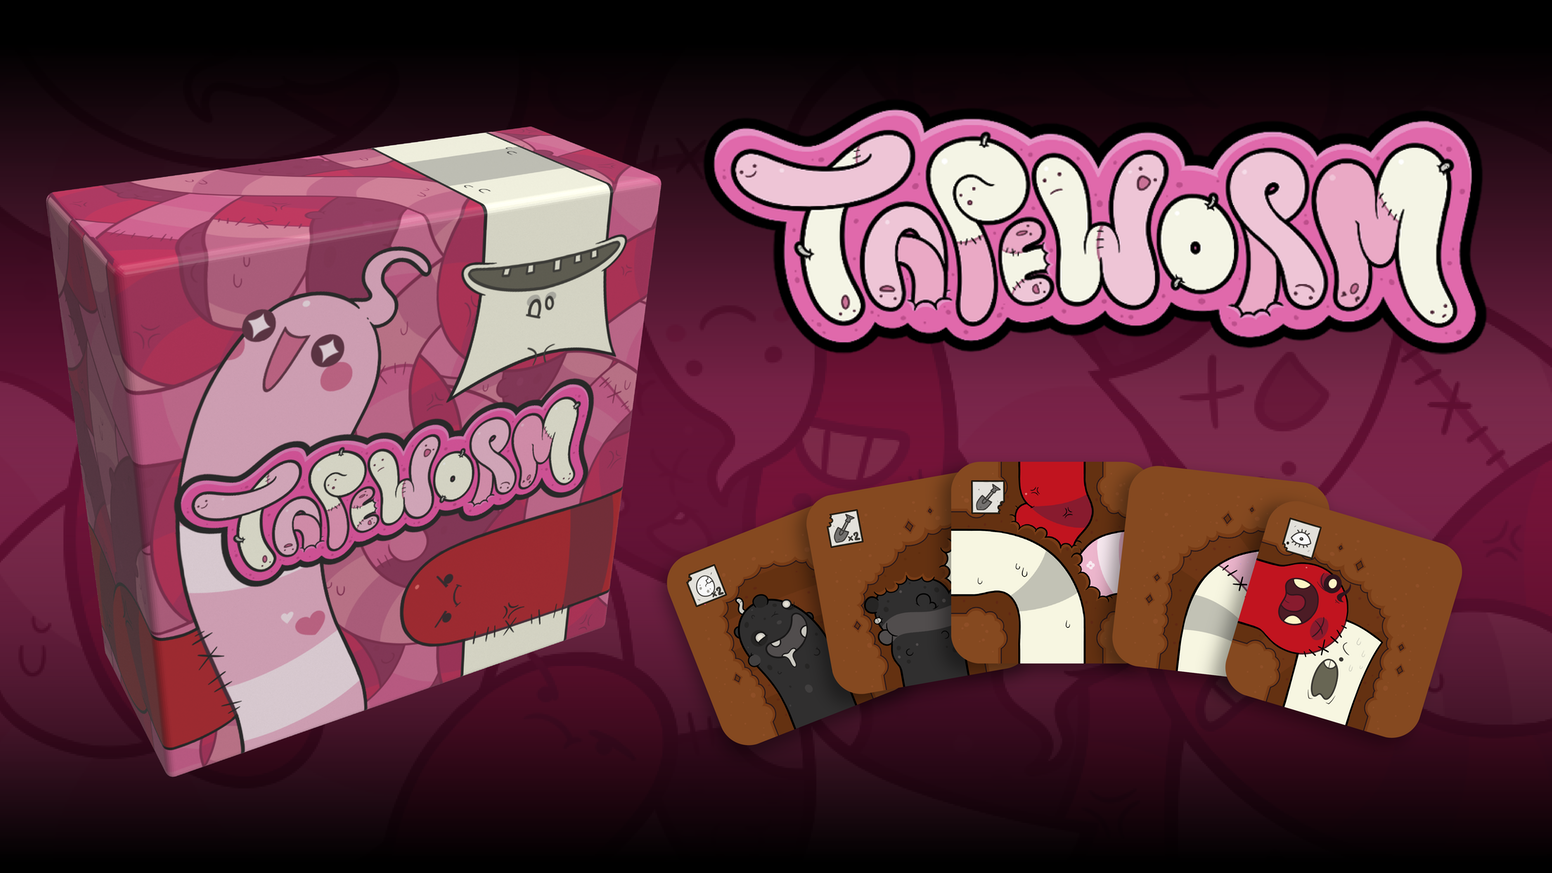 Tapeworm — настольная игра от автора The Binding of Isaac